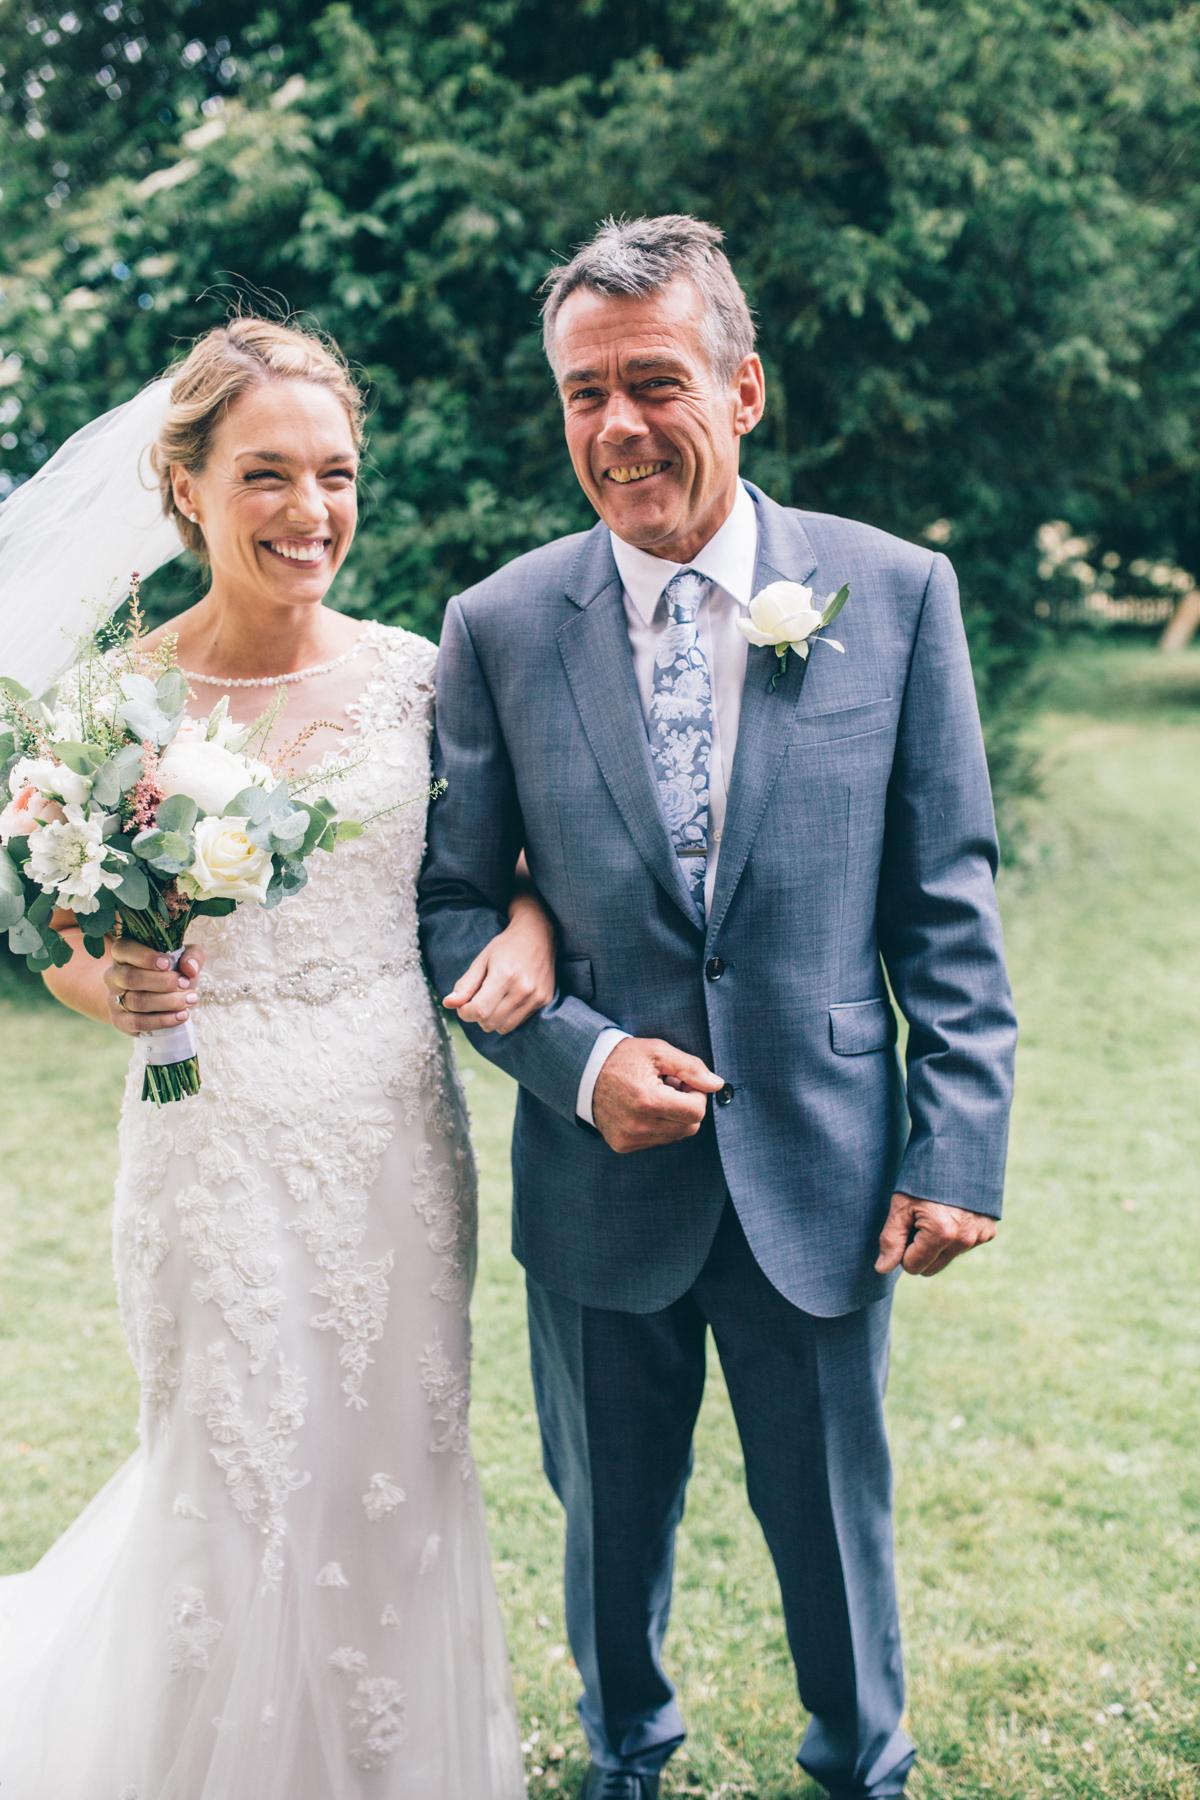 Sarah + Caco Tipi Village Green Wedding Buckinghamshire NaomiJanePhotography-37.jpg